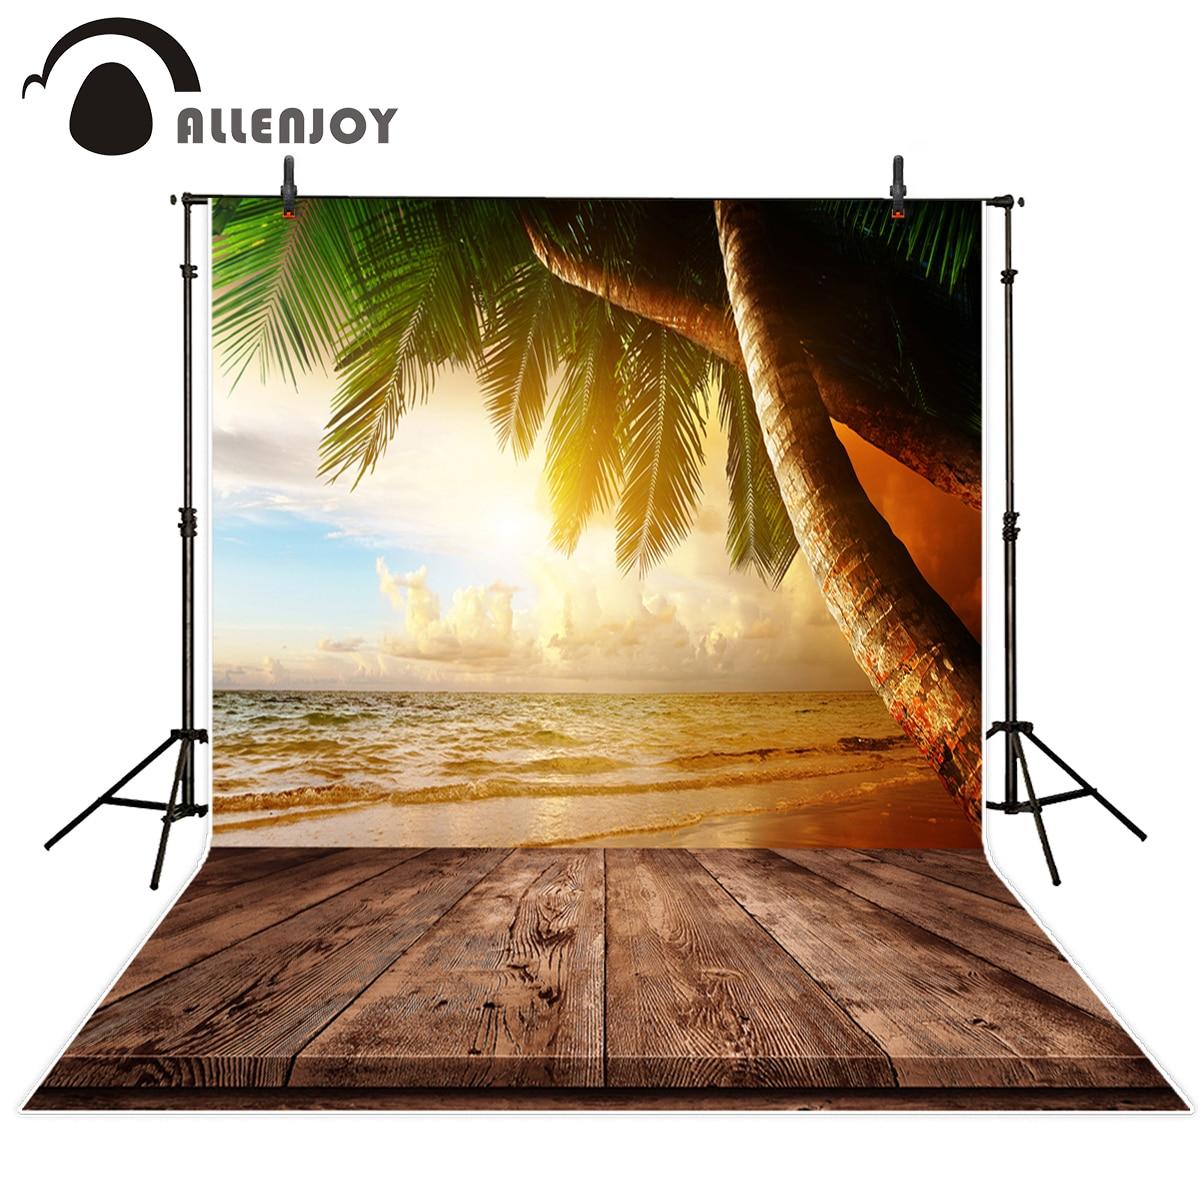 Allenjoy photography theme background Sunset Sea coconut tree Beach for summer photos personal customize camera backdrop sunset sea surf beach fantasy landscape